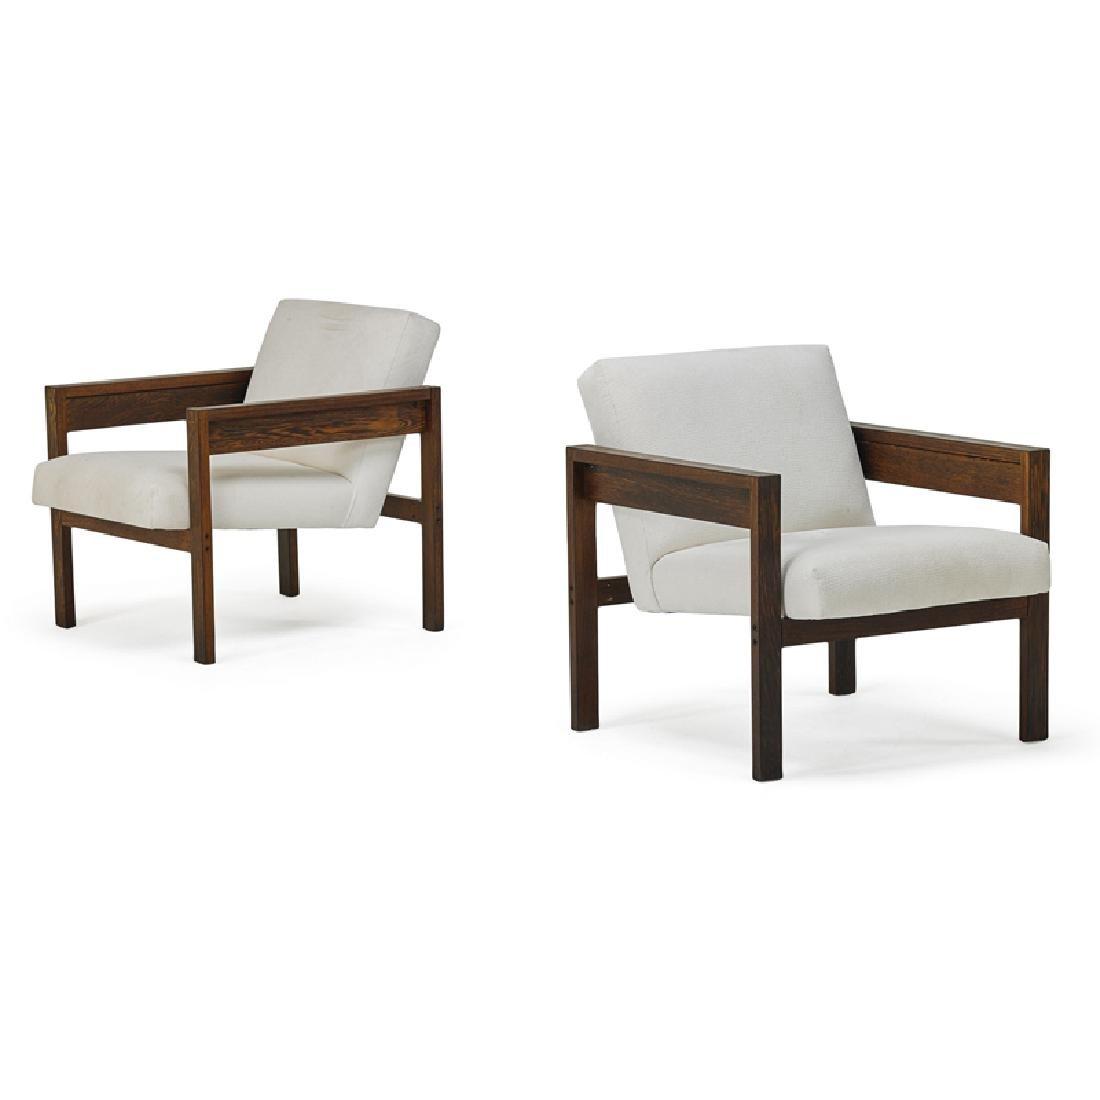 HEIN STOLLE; SPECTRUM Pair of armchairs